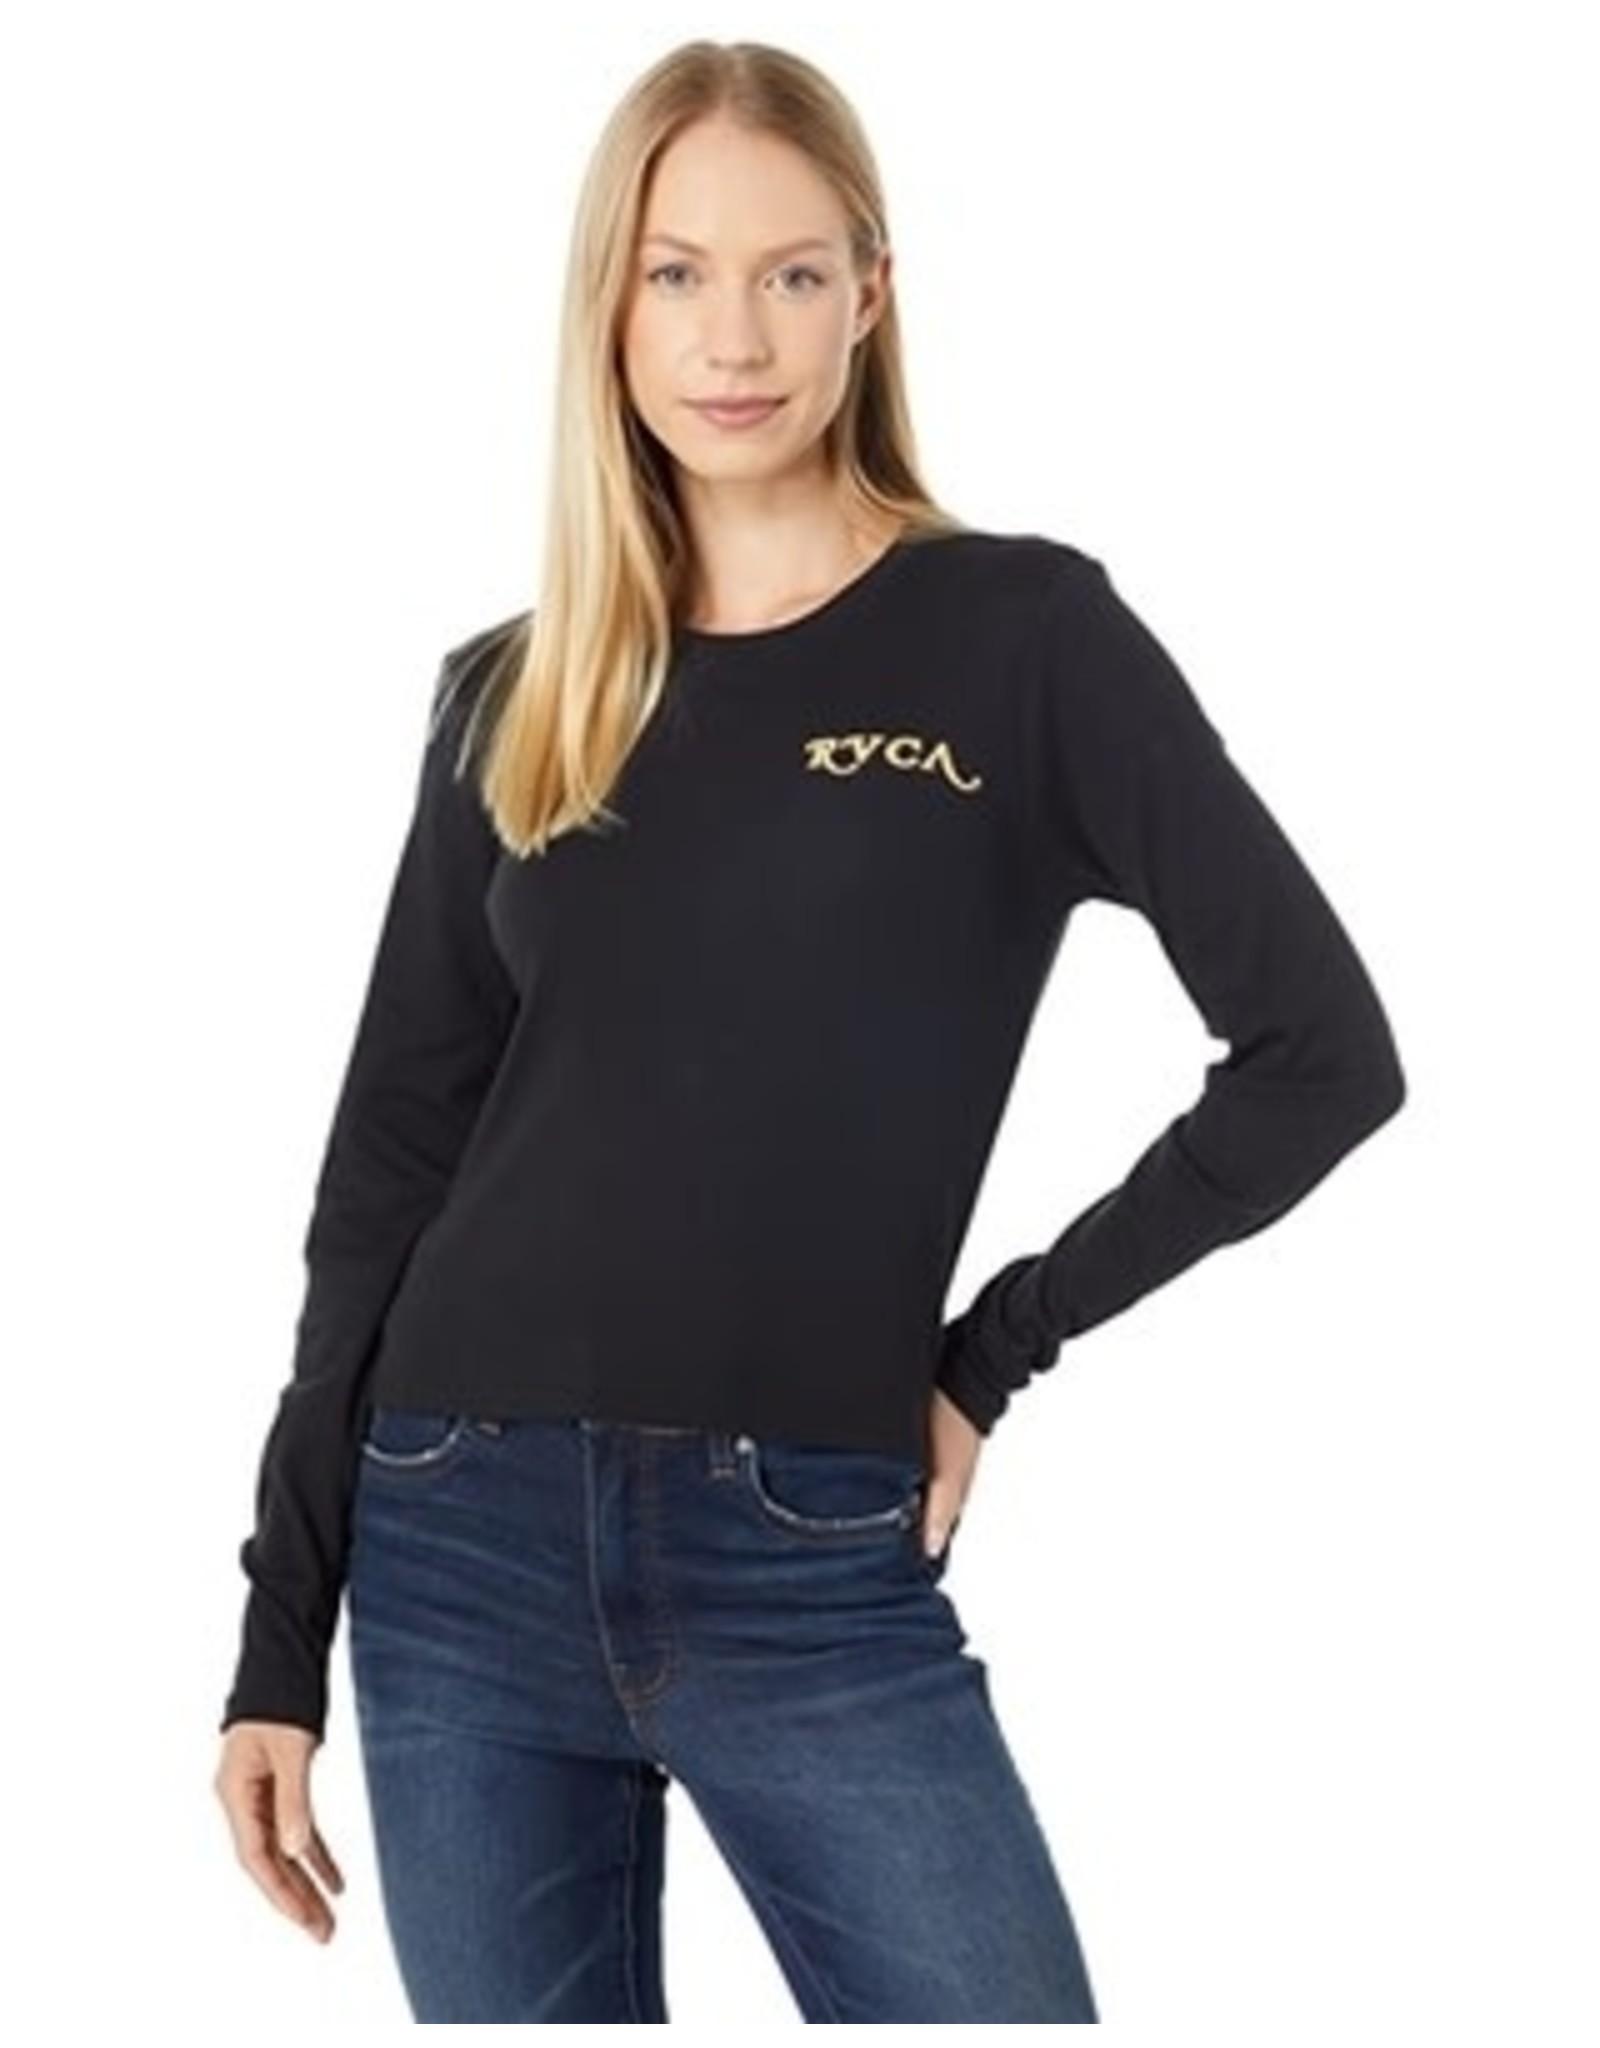 RVCA Retro Long Sleeve Shirt